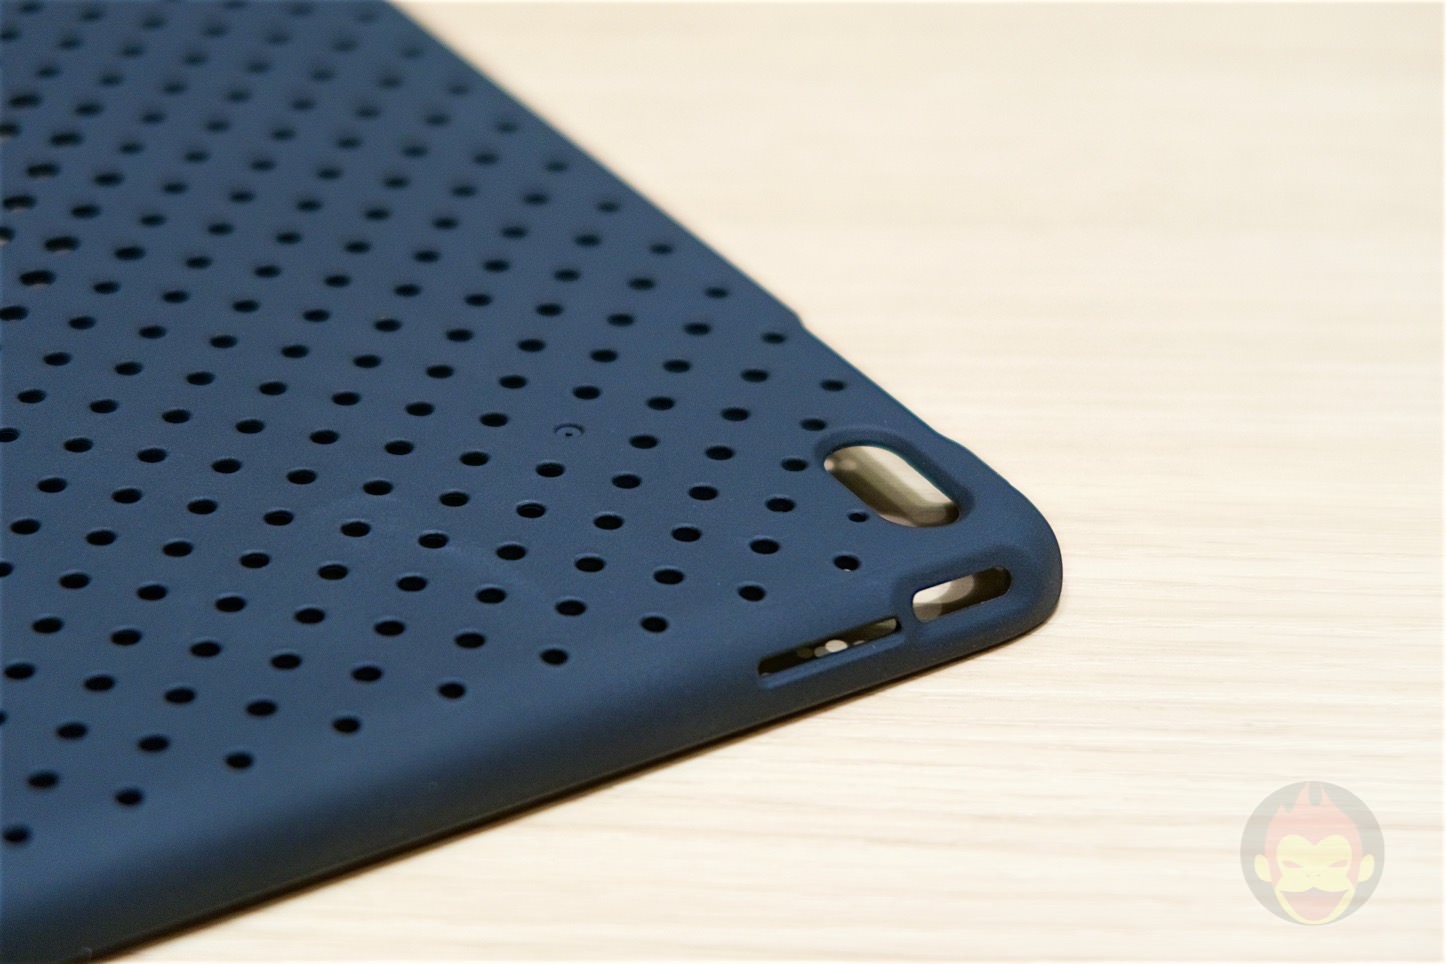 Andmesh-Mesh-Case-for-iPad-Pro-05.jpg